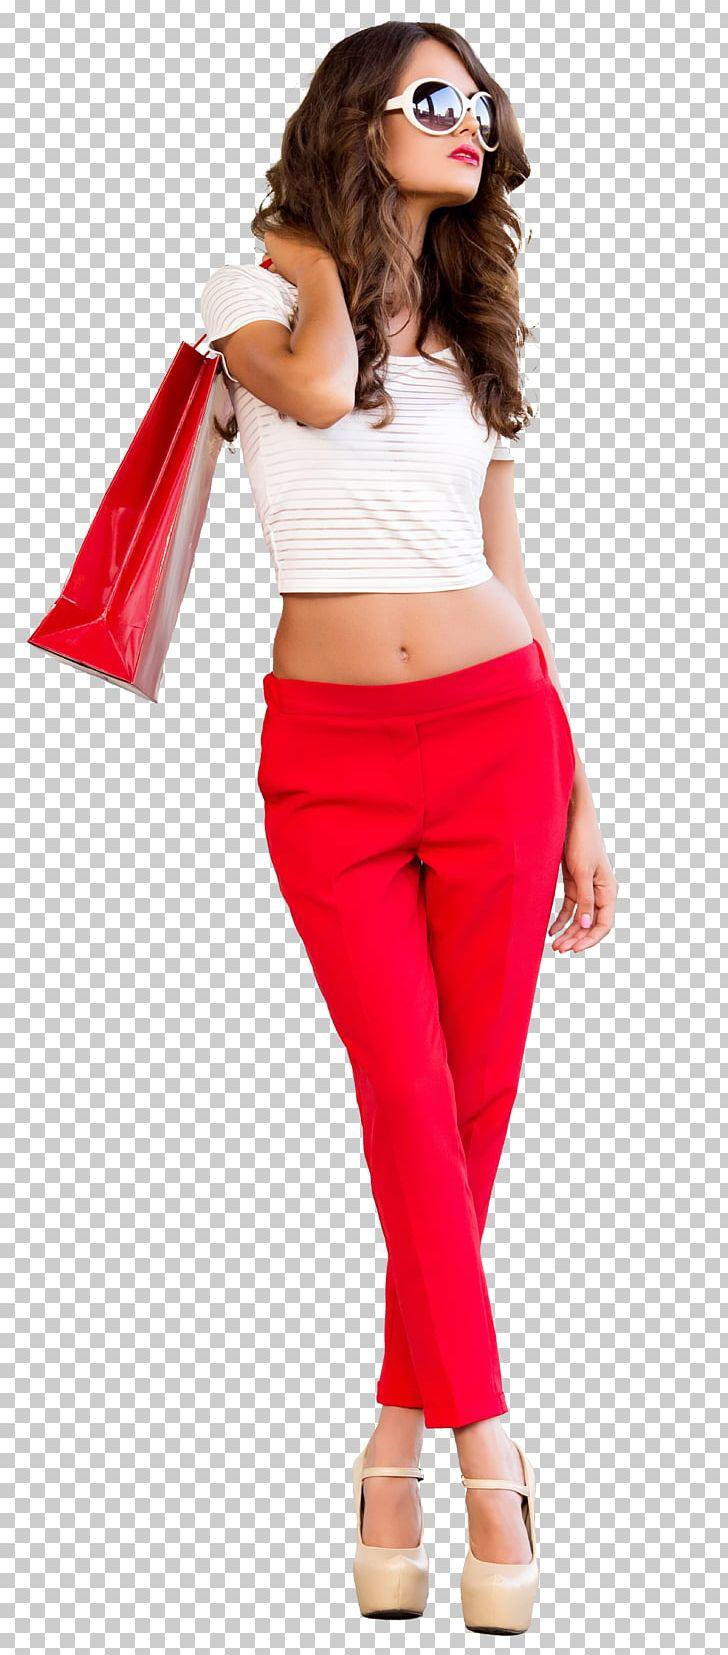 Fashion Model Bijin PNG, Clipart, Abdomen, Advertising, Bag, Baggage, Beauty Salon Free PNG Download